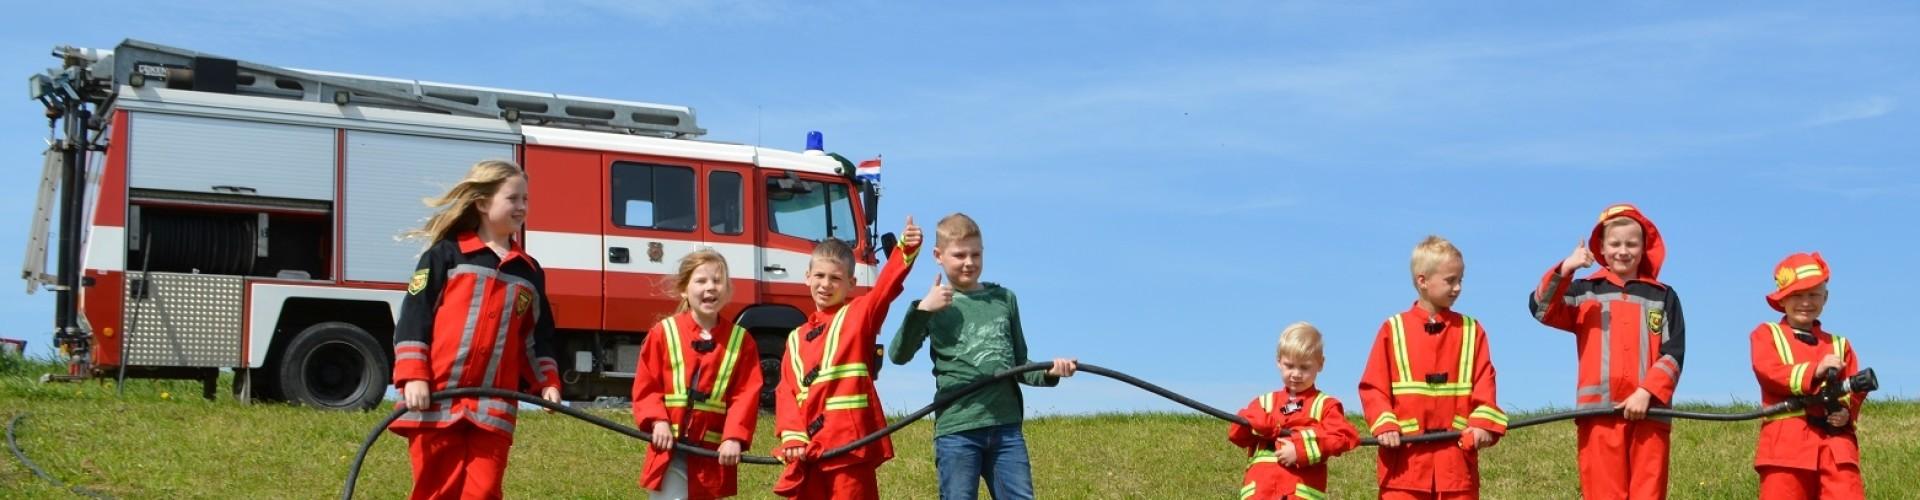 Kinderfeestje brandweer en vervoer met brandweerauto